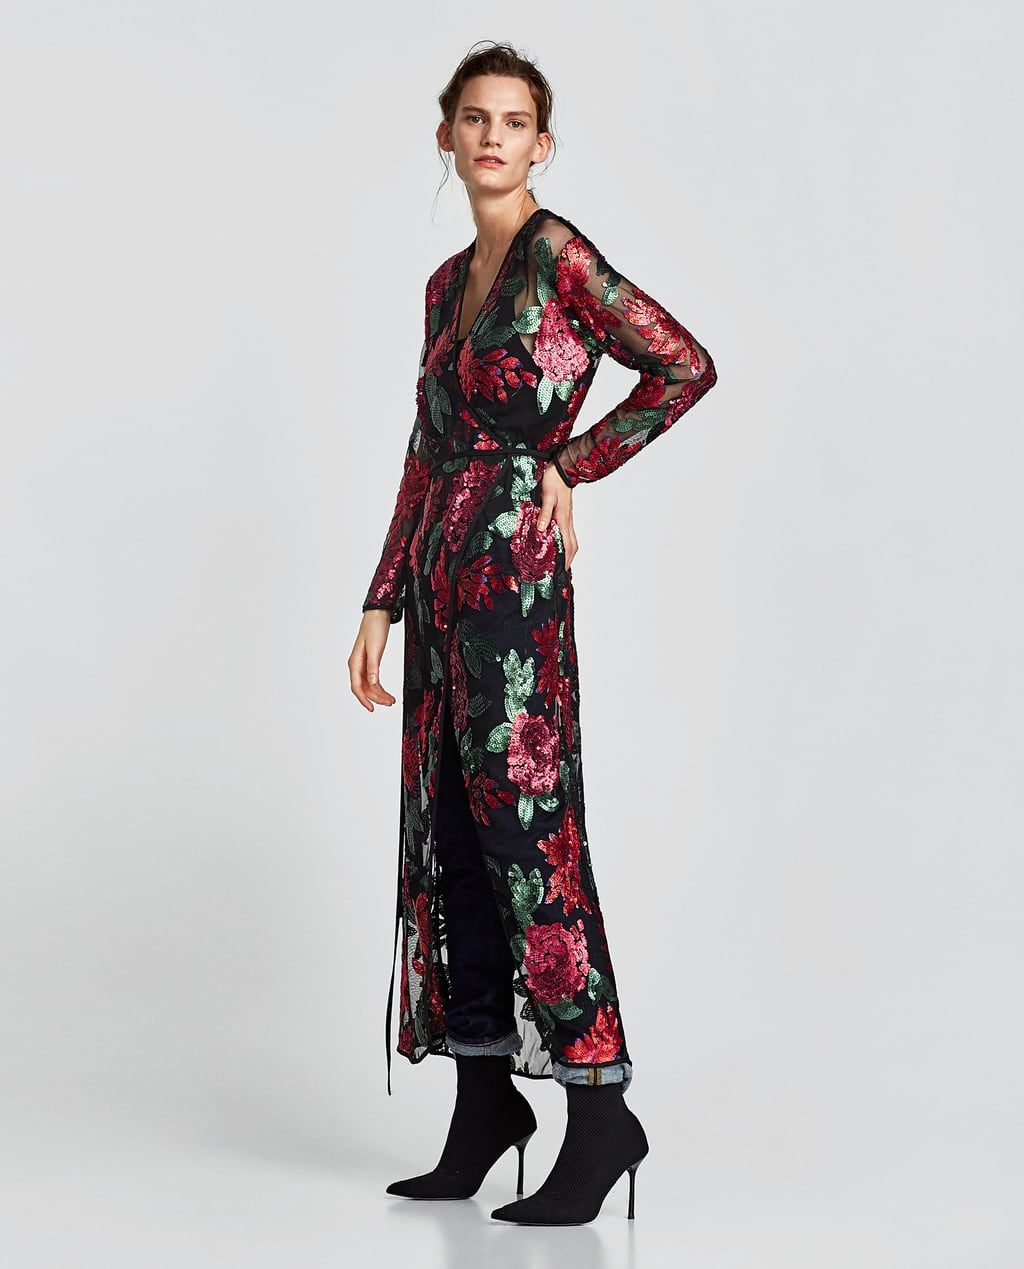 ZARA - WOMAN - SEQUINNED CROSSOVER DRESS  Wickelkleid, Maxi